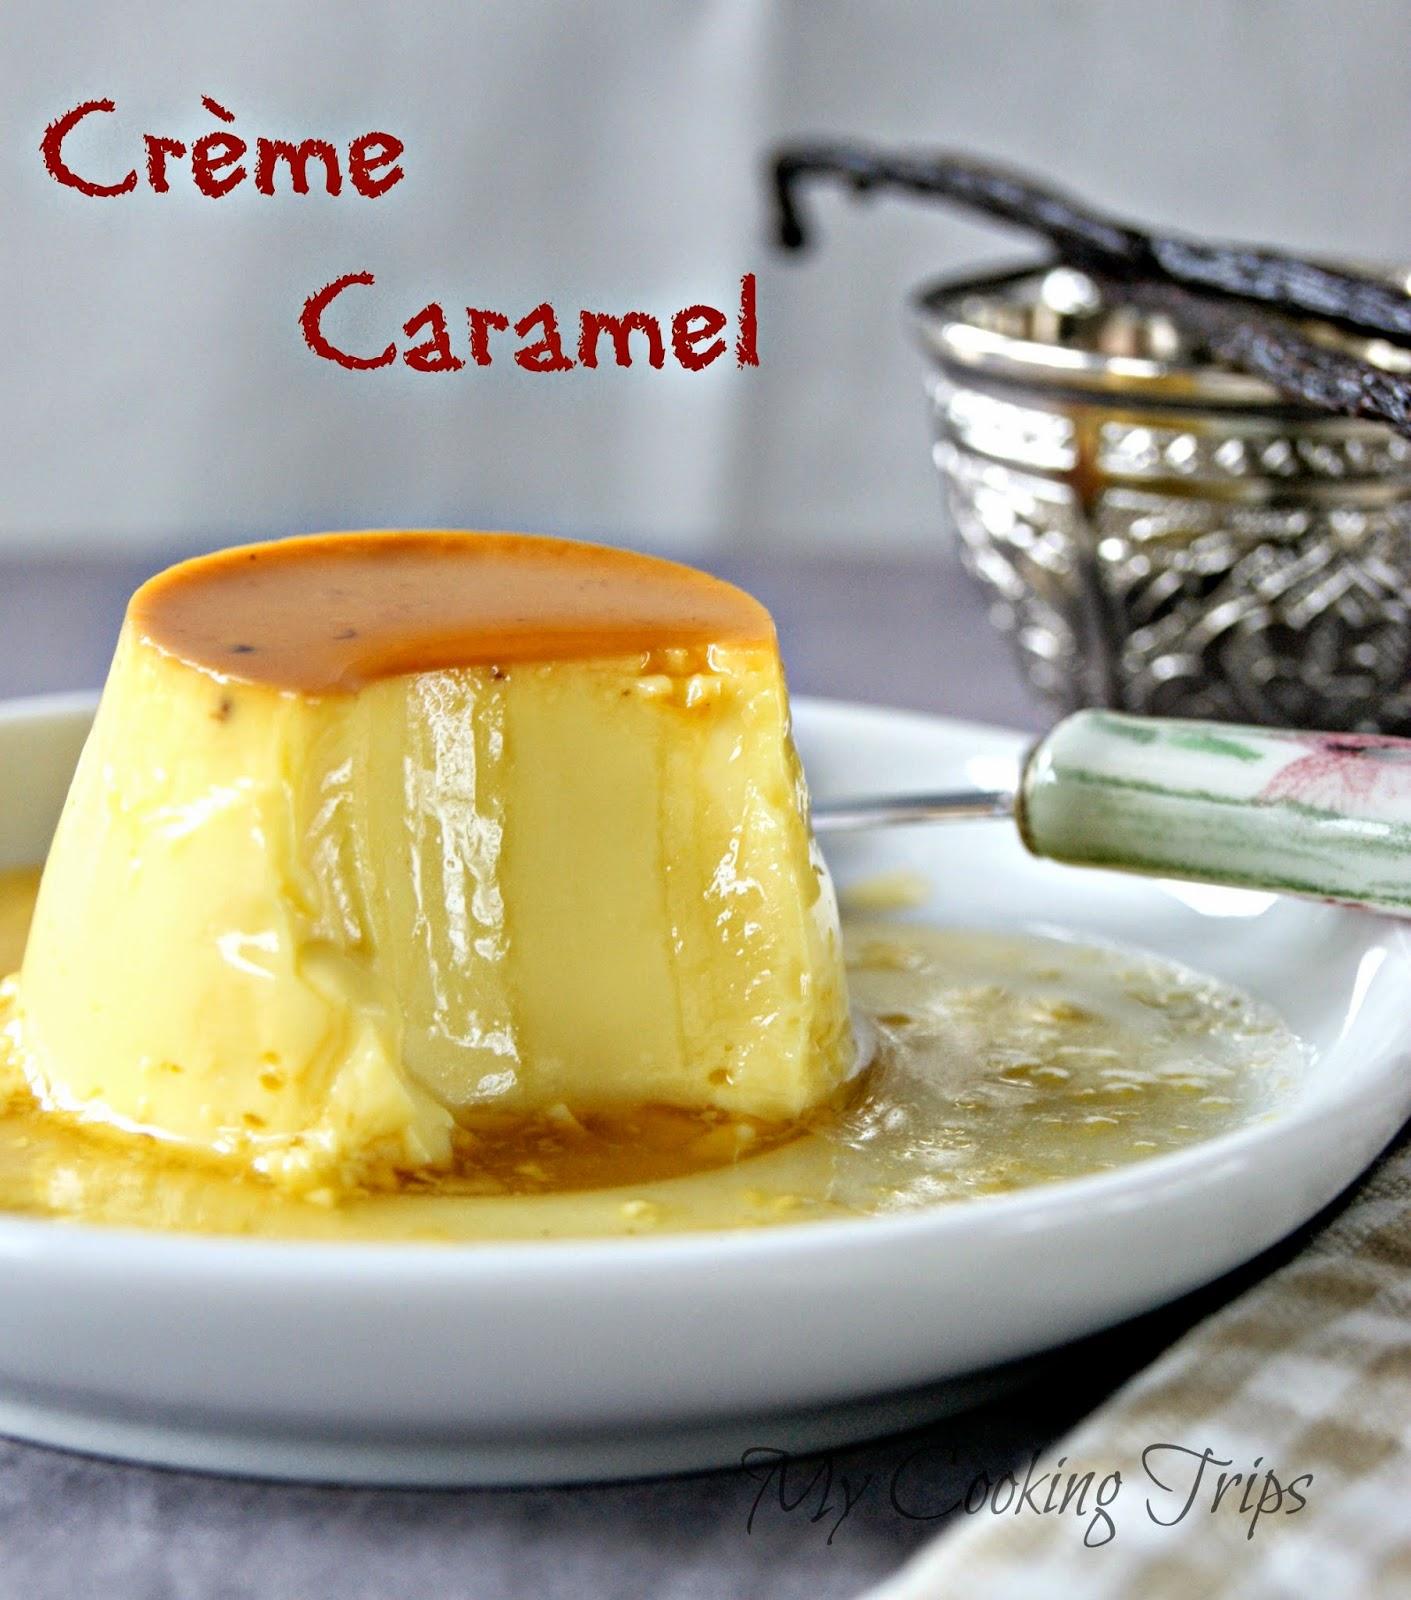 Crème Caramel Di Luca Montersino